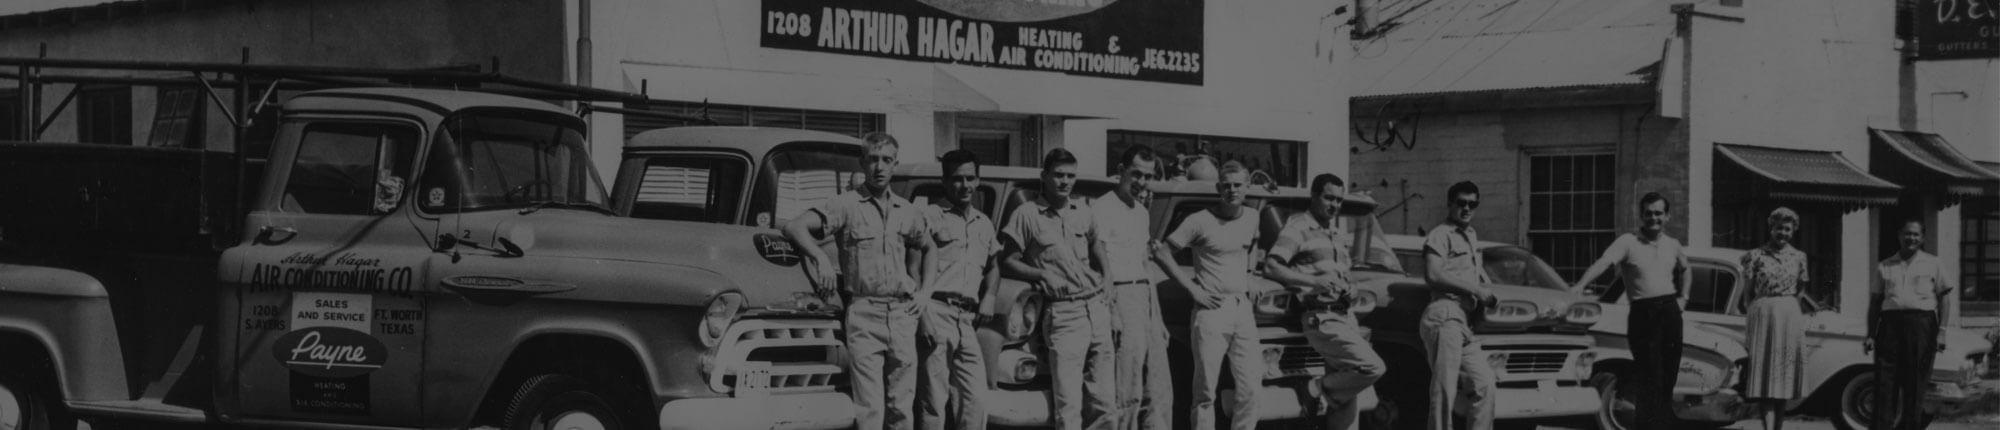 arthur-hagar-vintage